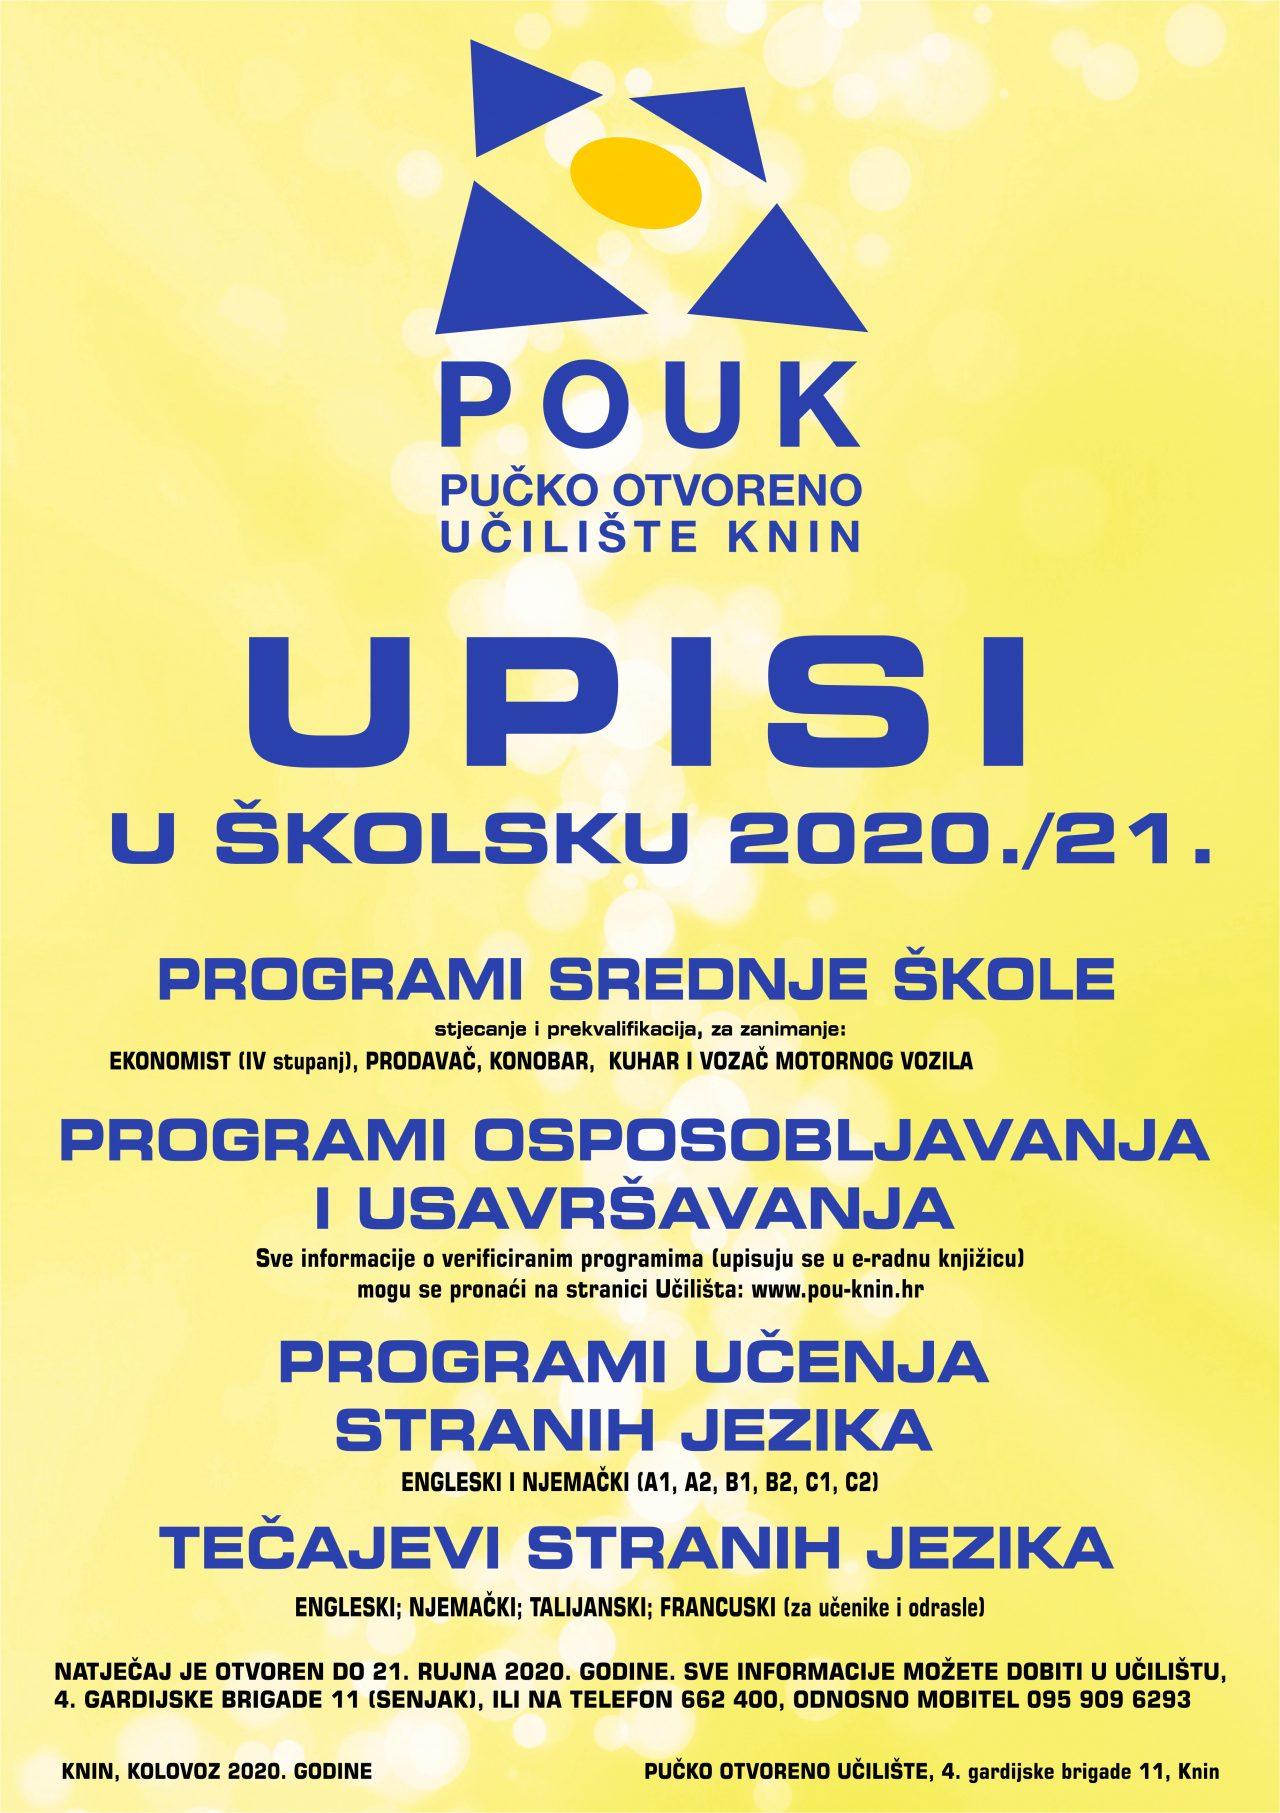 https://www.pou-knin.hr/wp-content/uploads/POUK-plakat-U-p-i-s-i-1280x1813.jpg